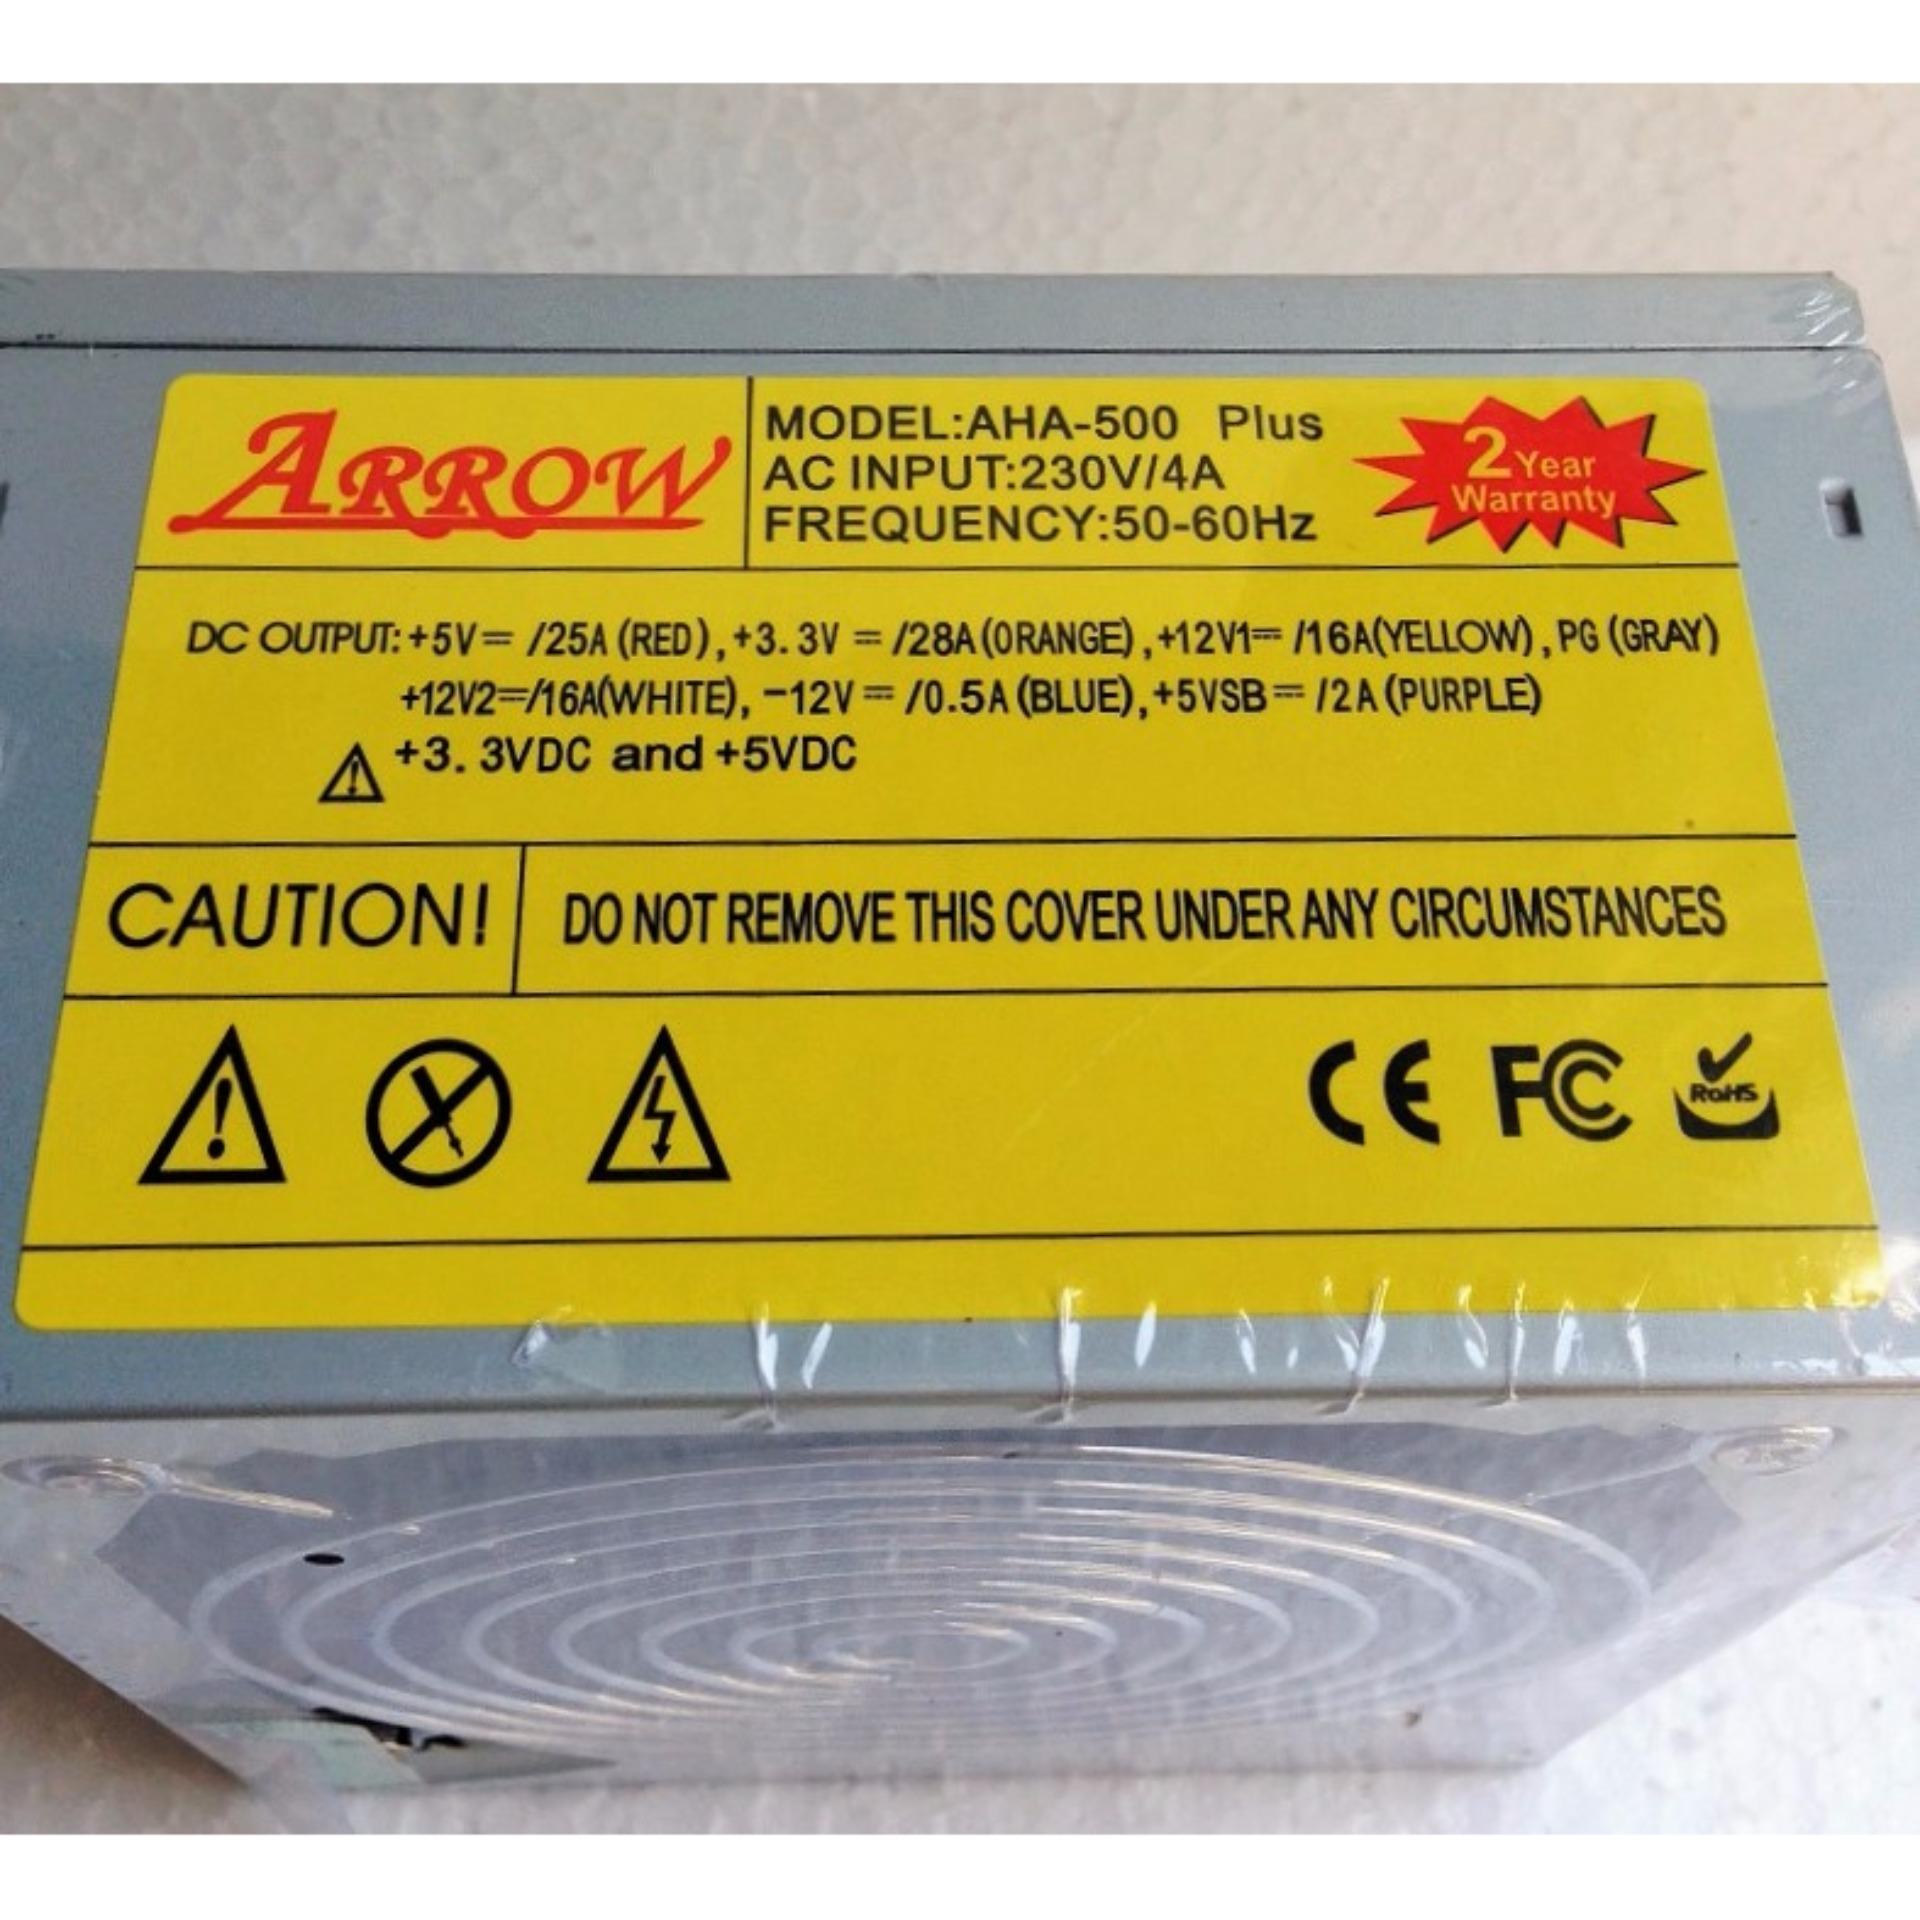 Bộ Nguồn Vi Tính PC ARROW AHA-500 Plus